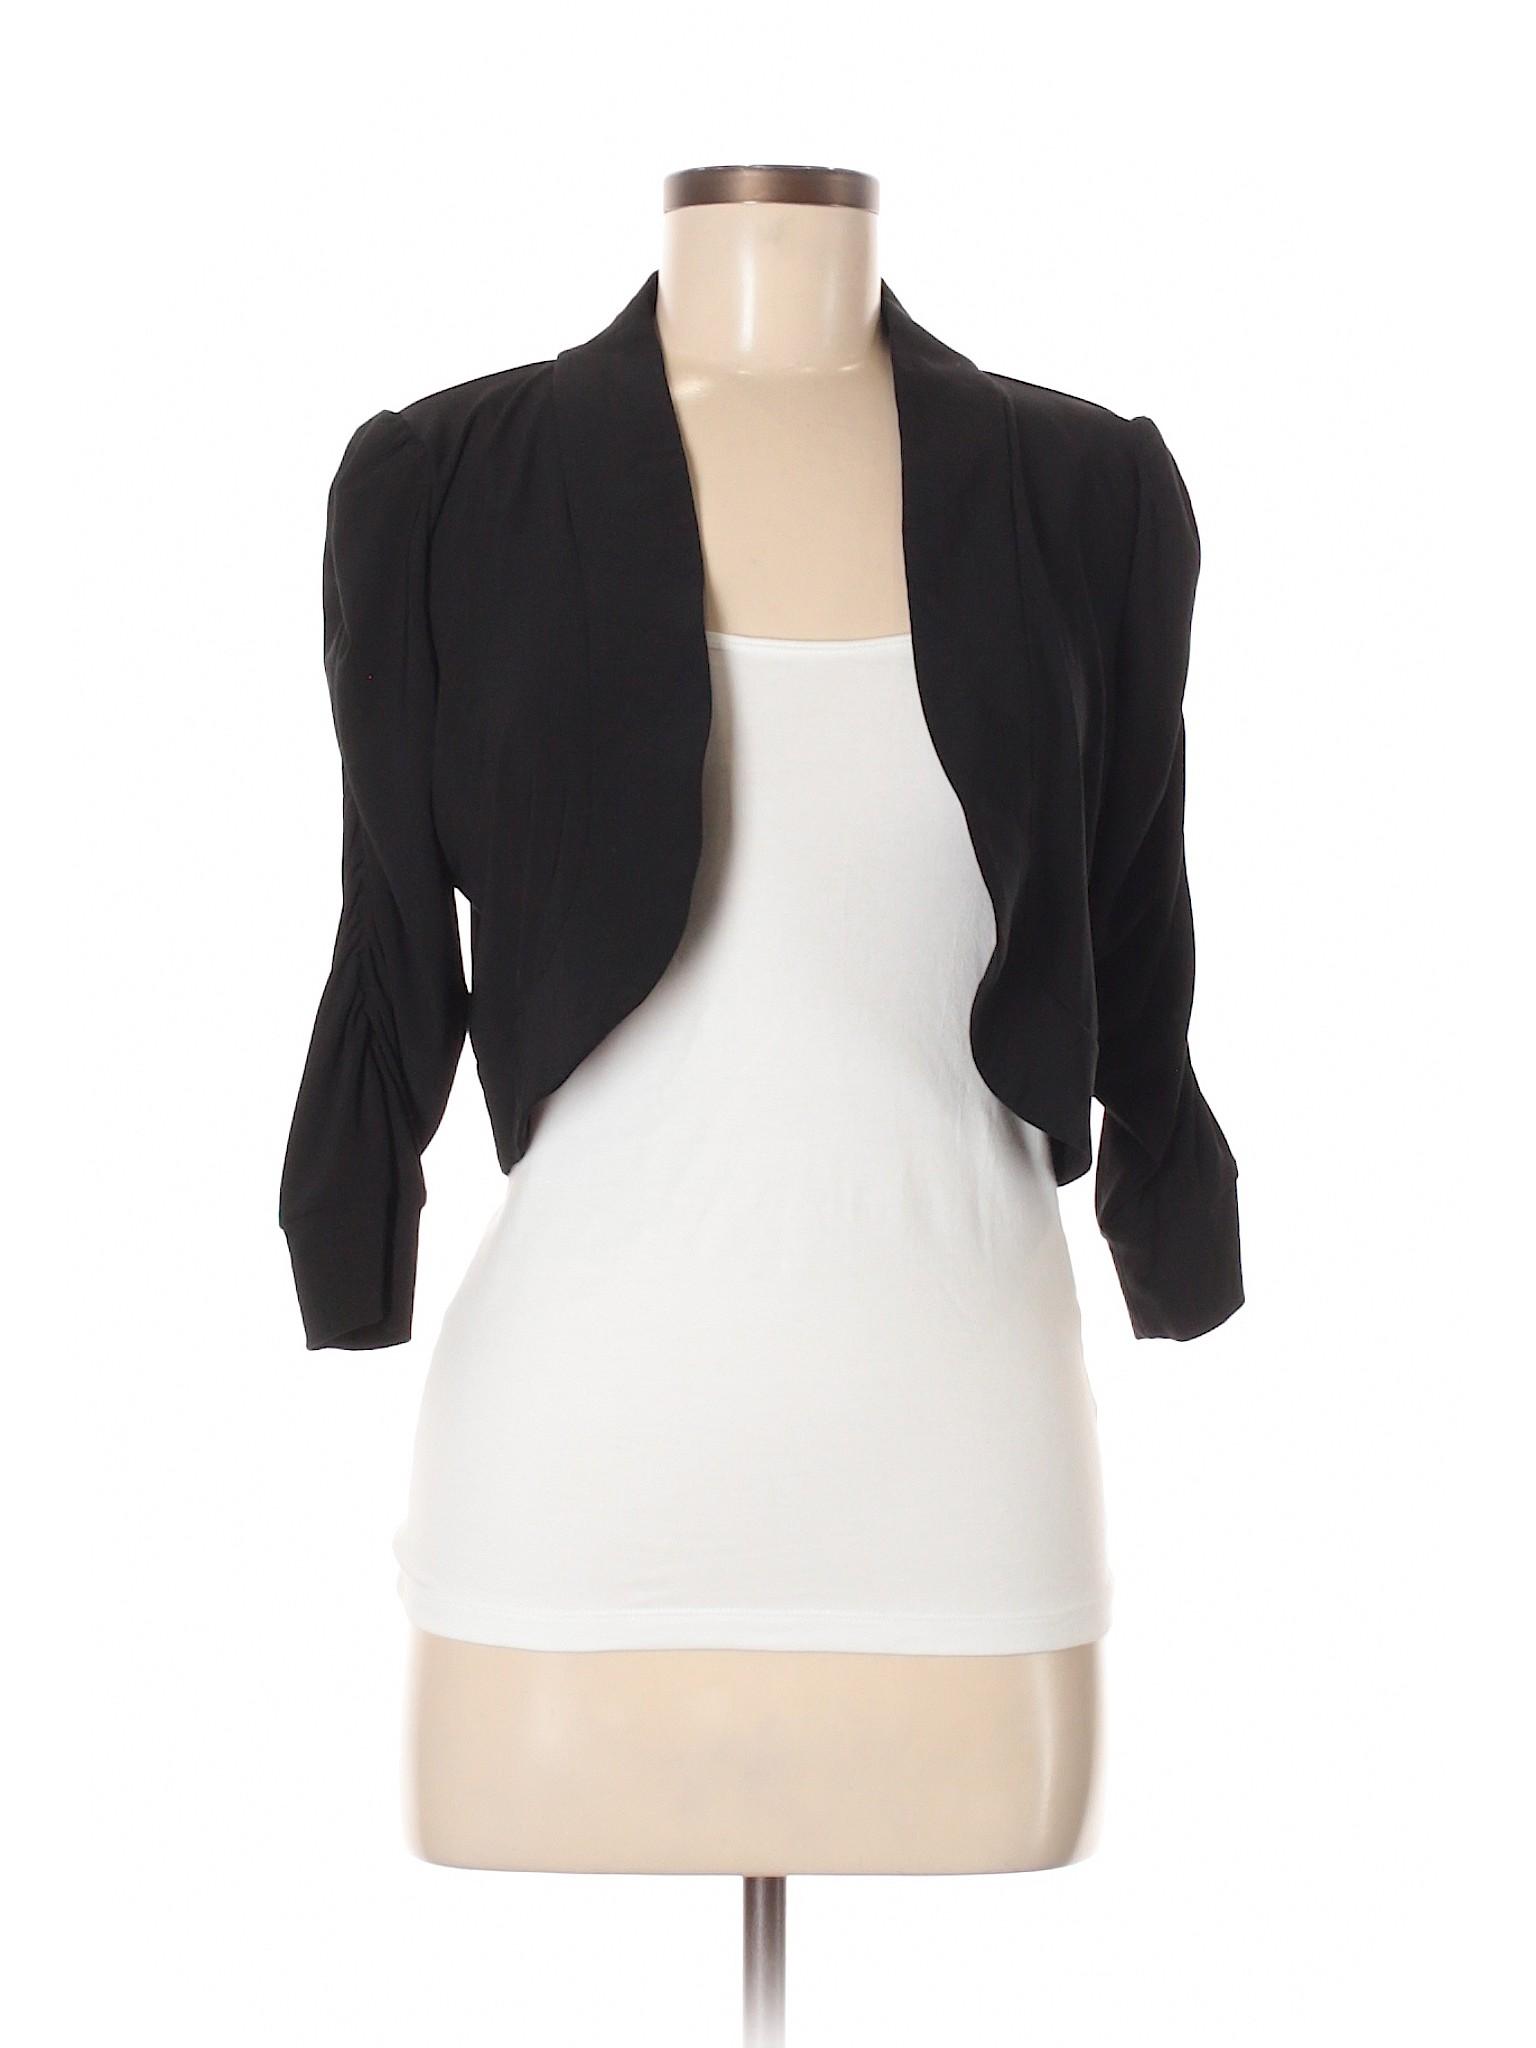 Lennie For Leonard Boutique Shrug Winter Nina AaRx55qY6w